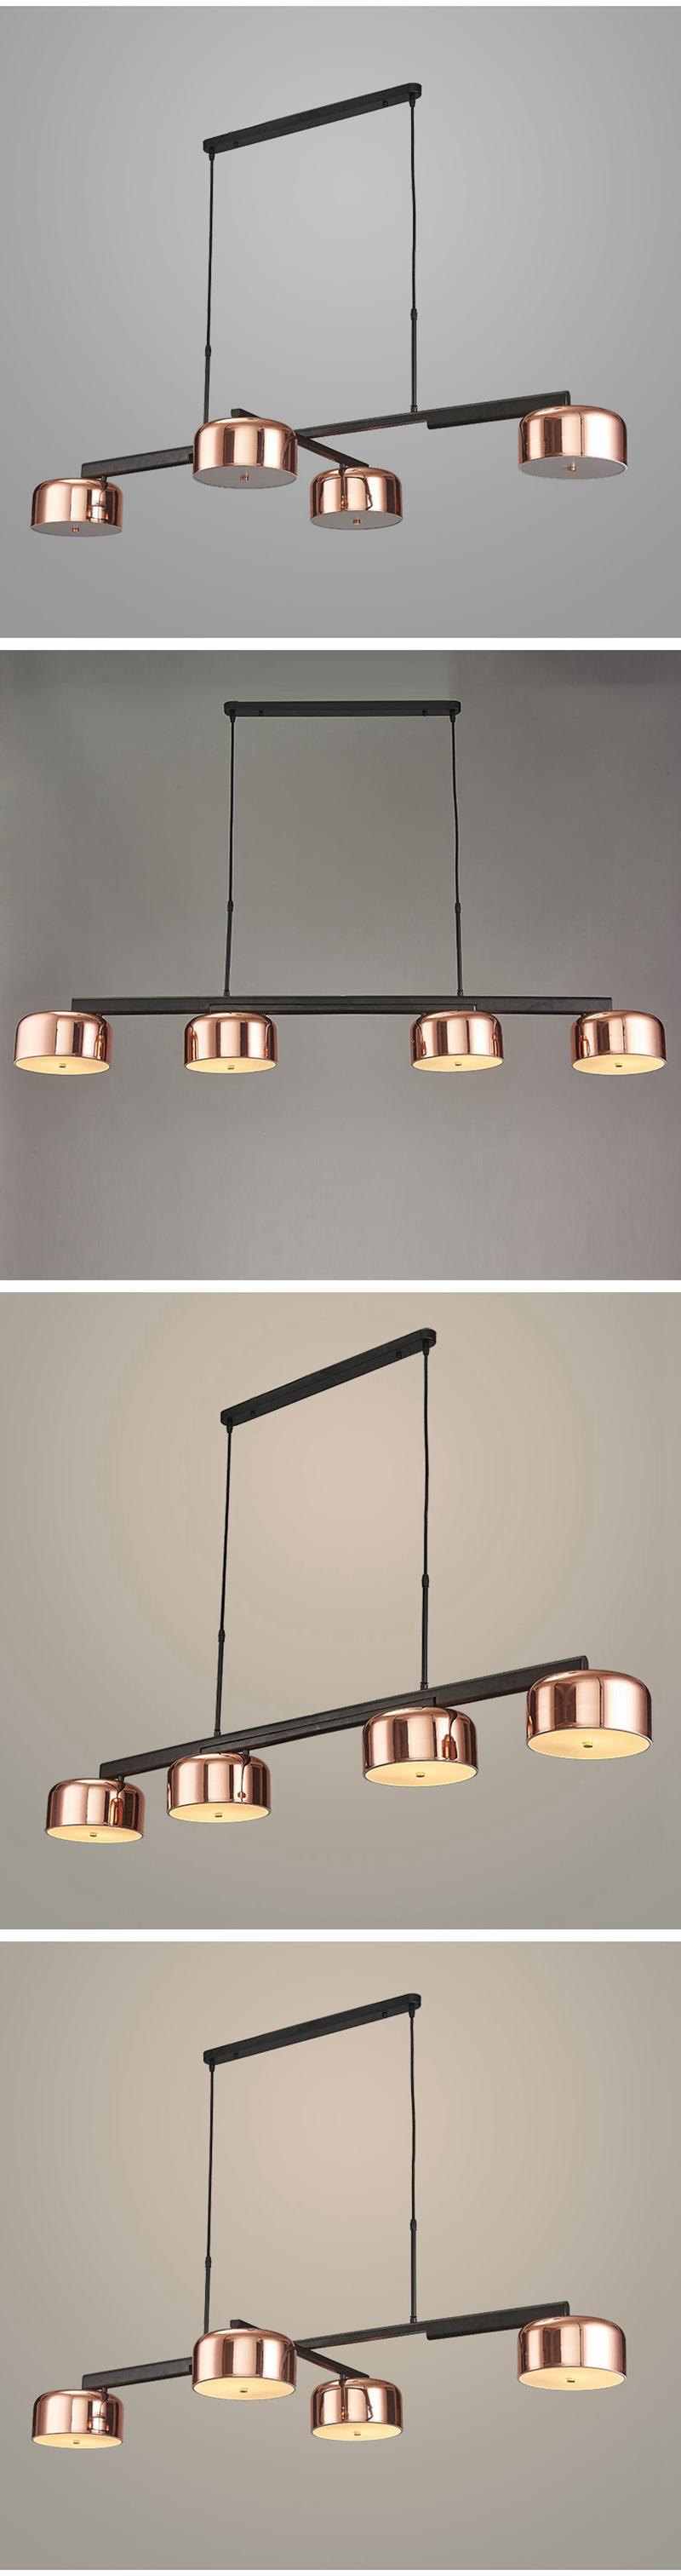 Modern simple 4 arm LED pendant light rose gold metal plating